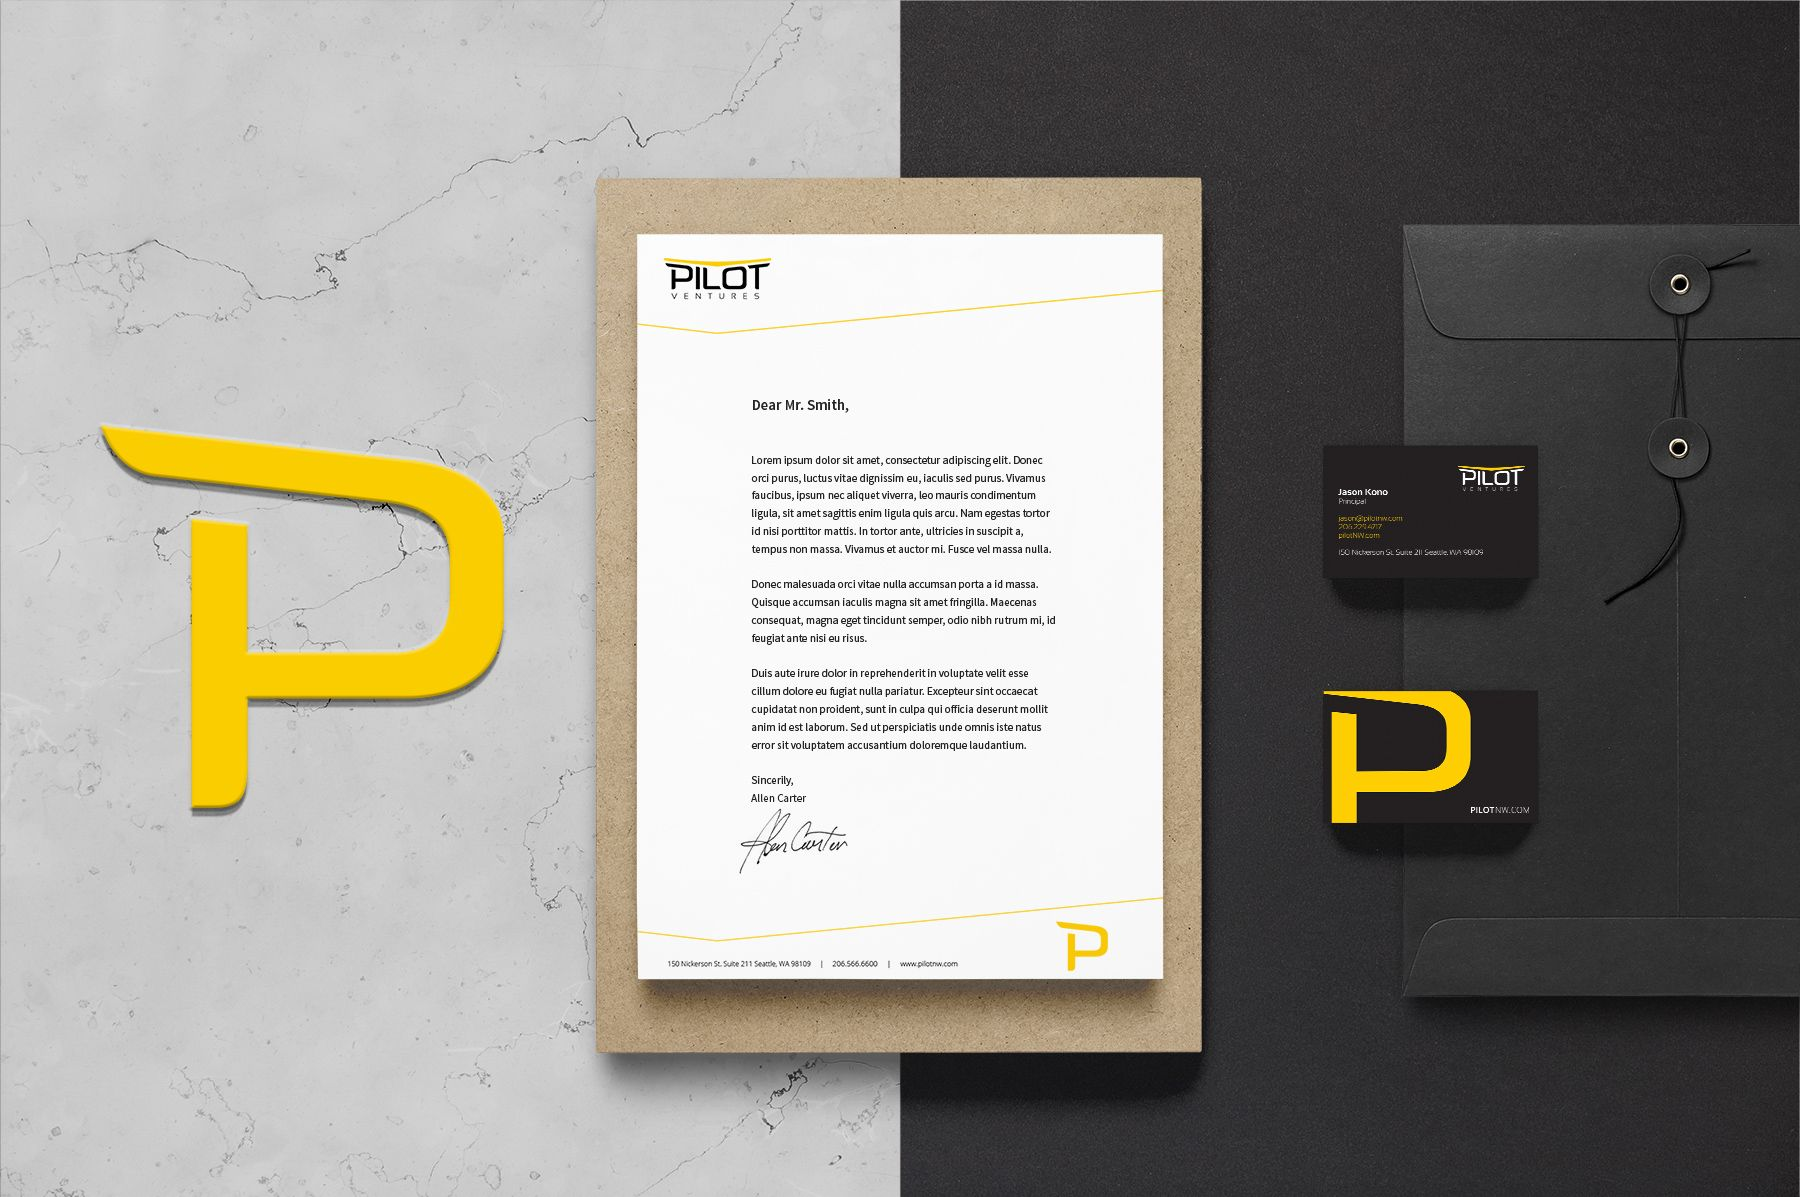 Pilot Branding Identity Mockup